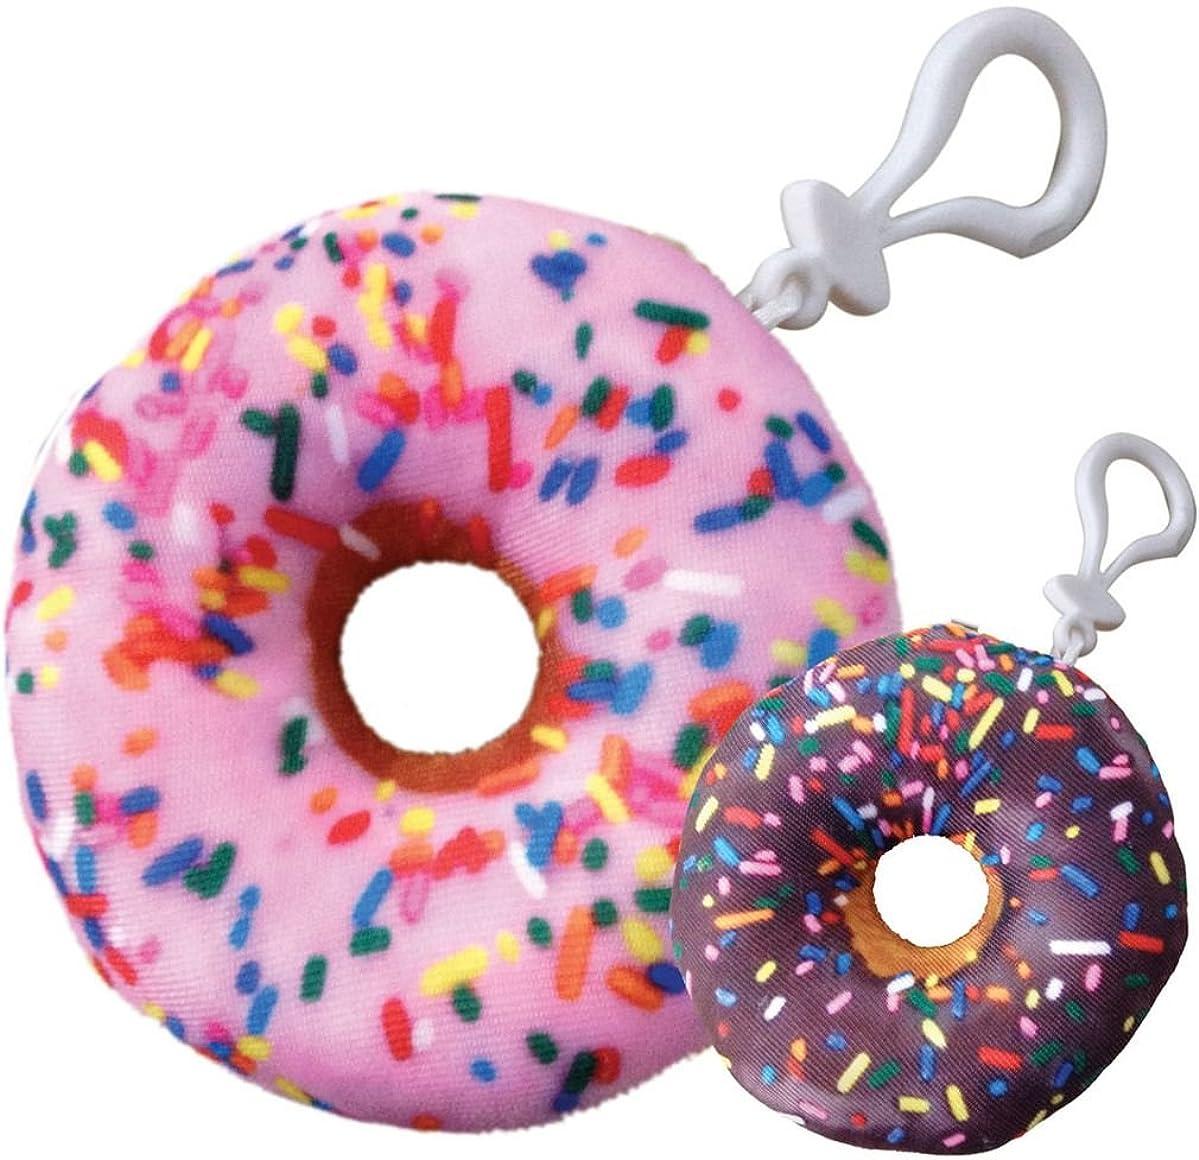 iscream Pink/Chocolate Donut Mini Microbead Pillow Backpack Charm